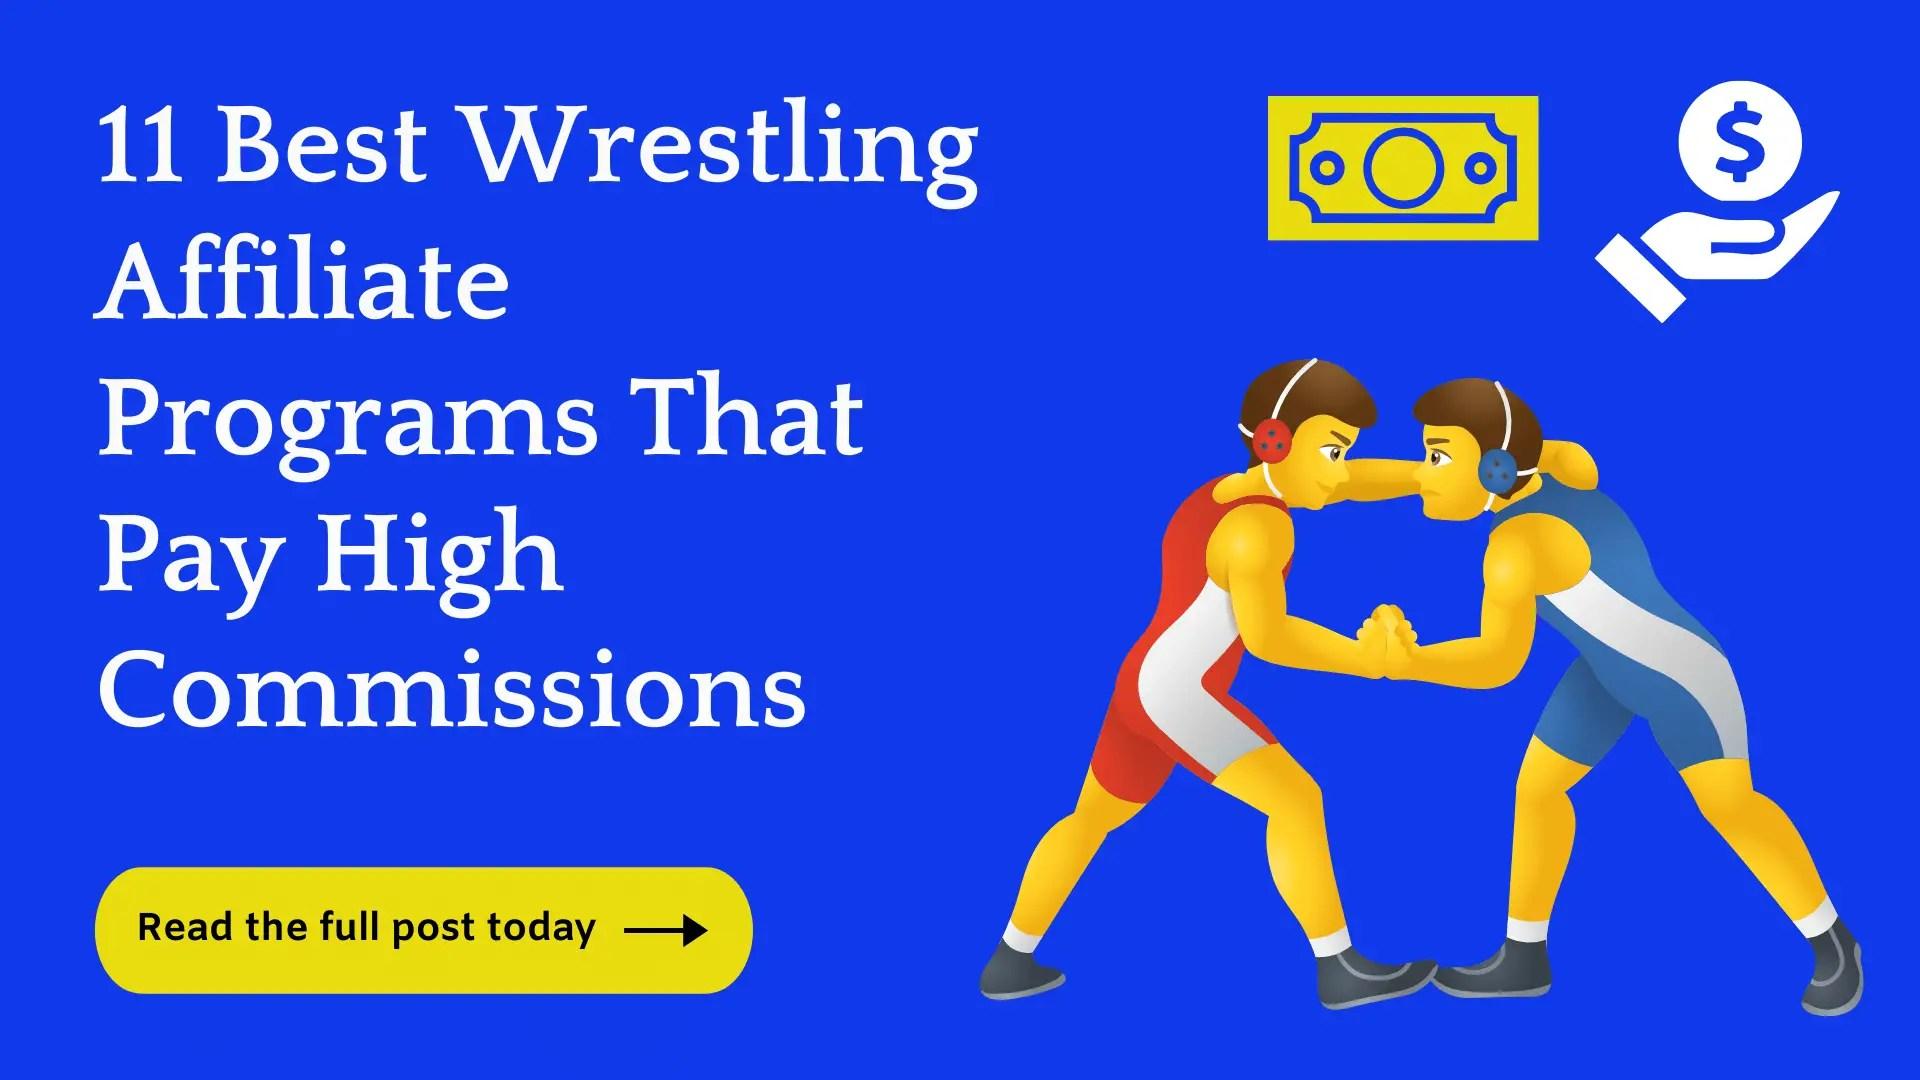 Top Wrestling Affiliate Programs